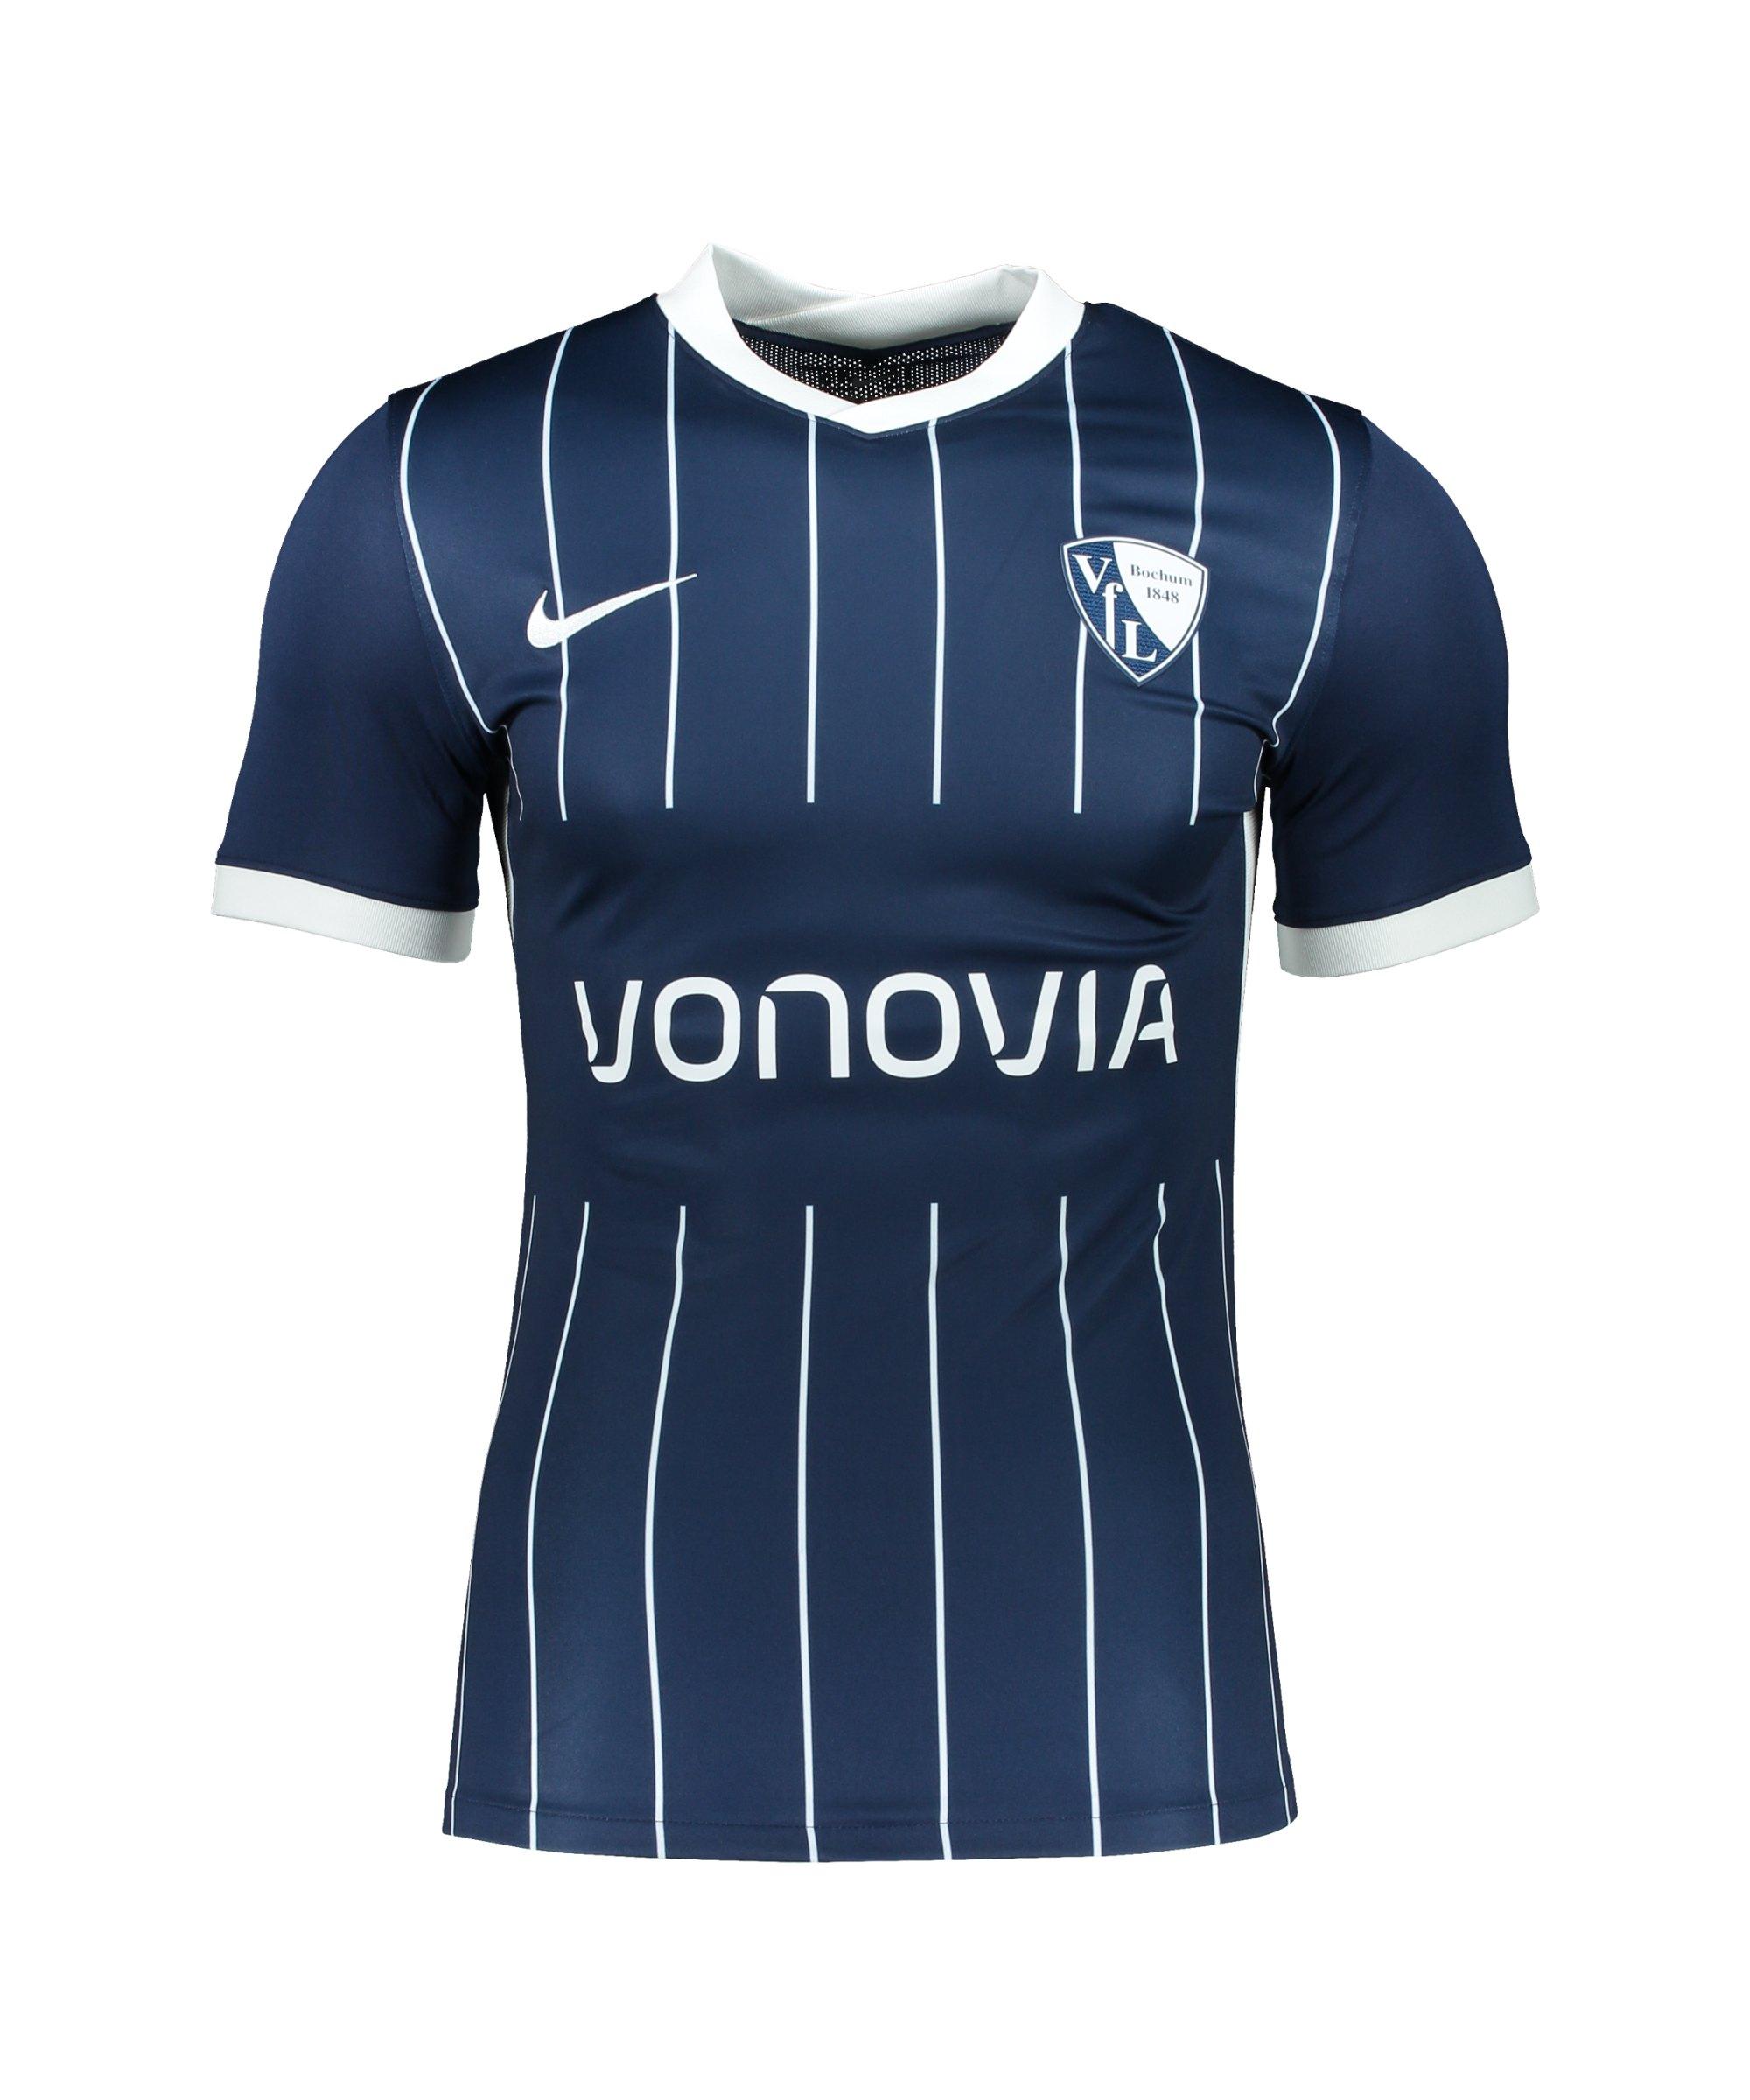 Nike VfL Bochum Trikot Home 2021/2022 Damen Blau F410 - blau